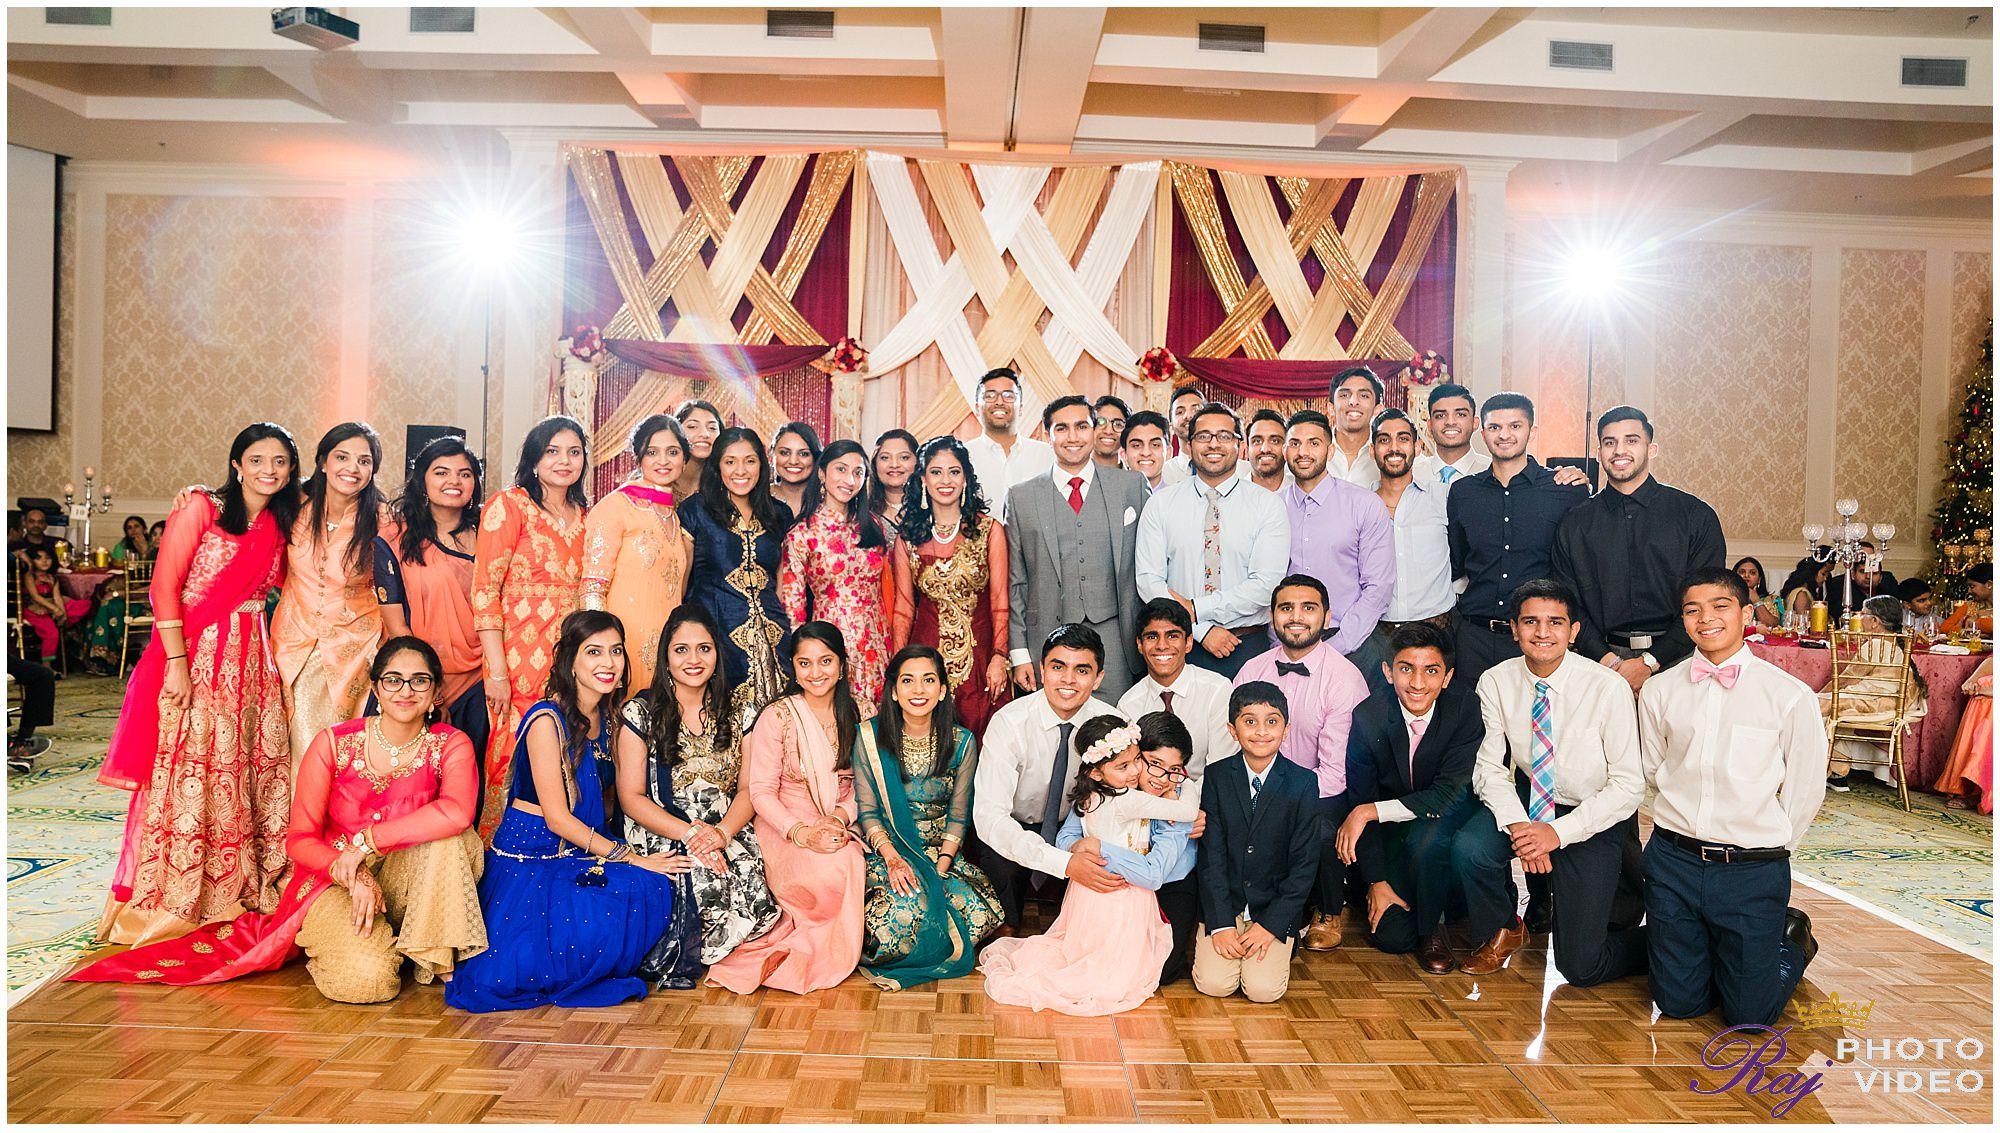 Founders-Inn-and-Spa-Virginia-Beach-VA-Indian-Wedding-Harini-Vivek-88.jpg